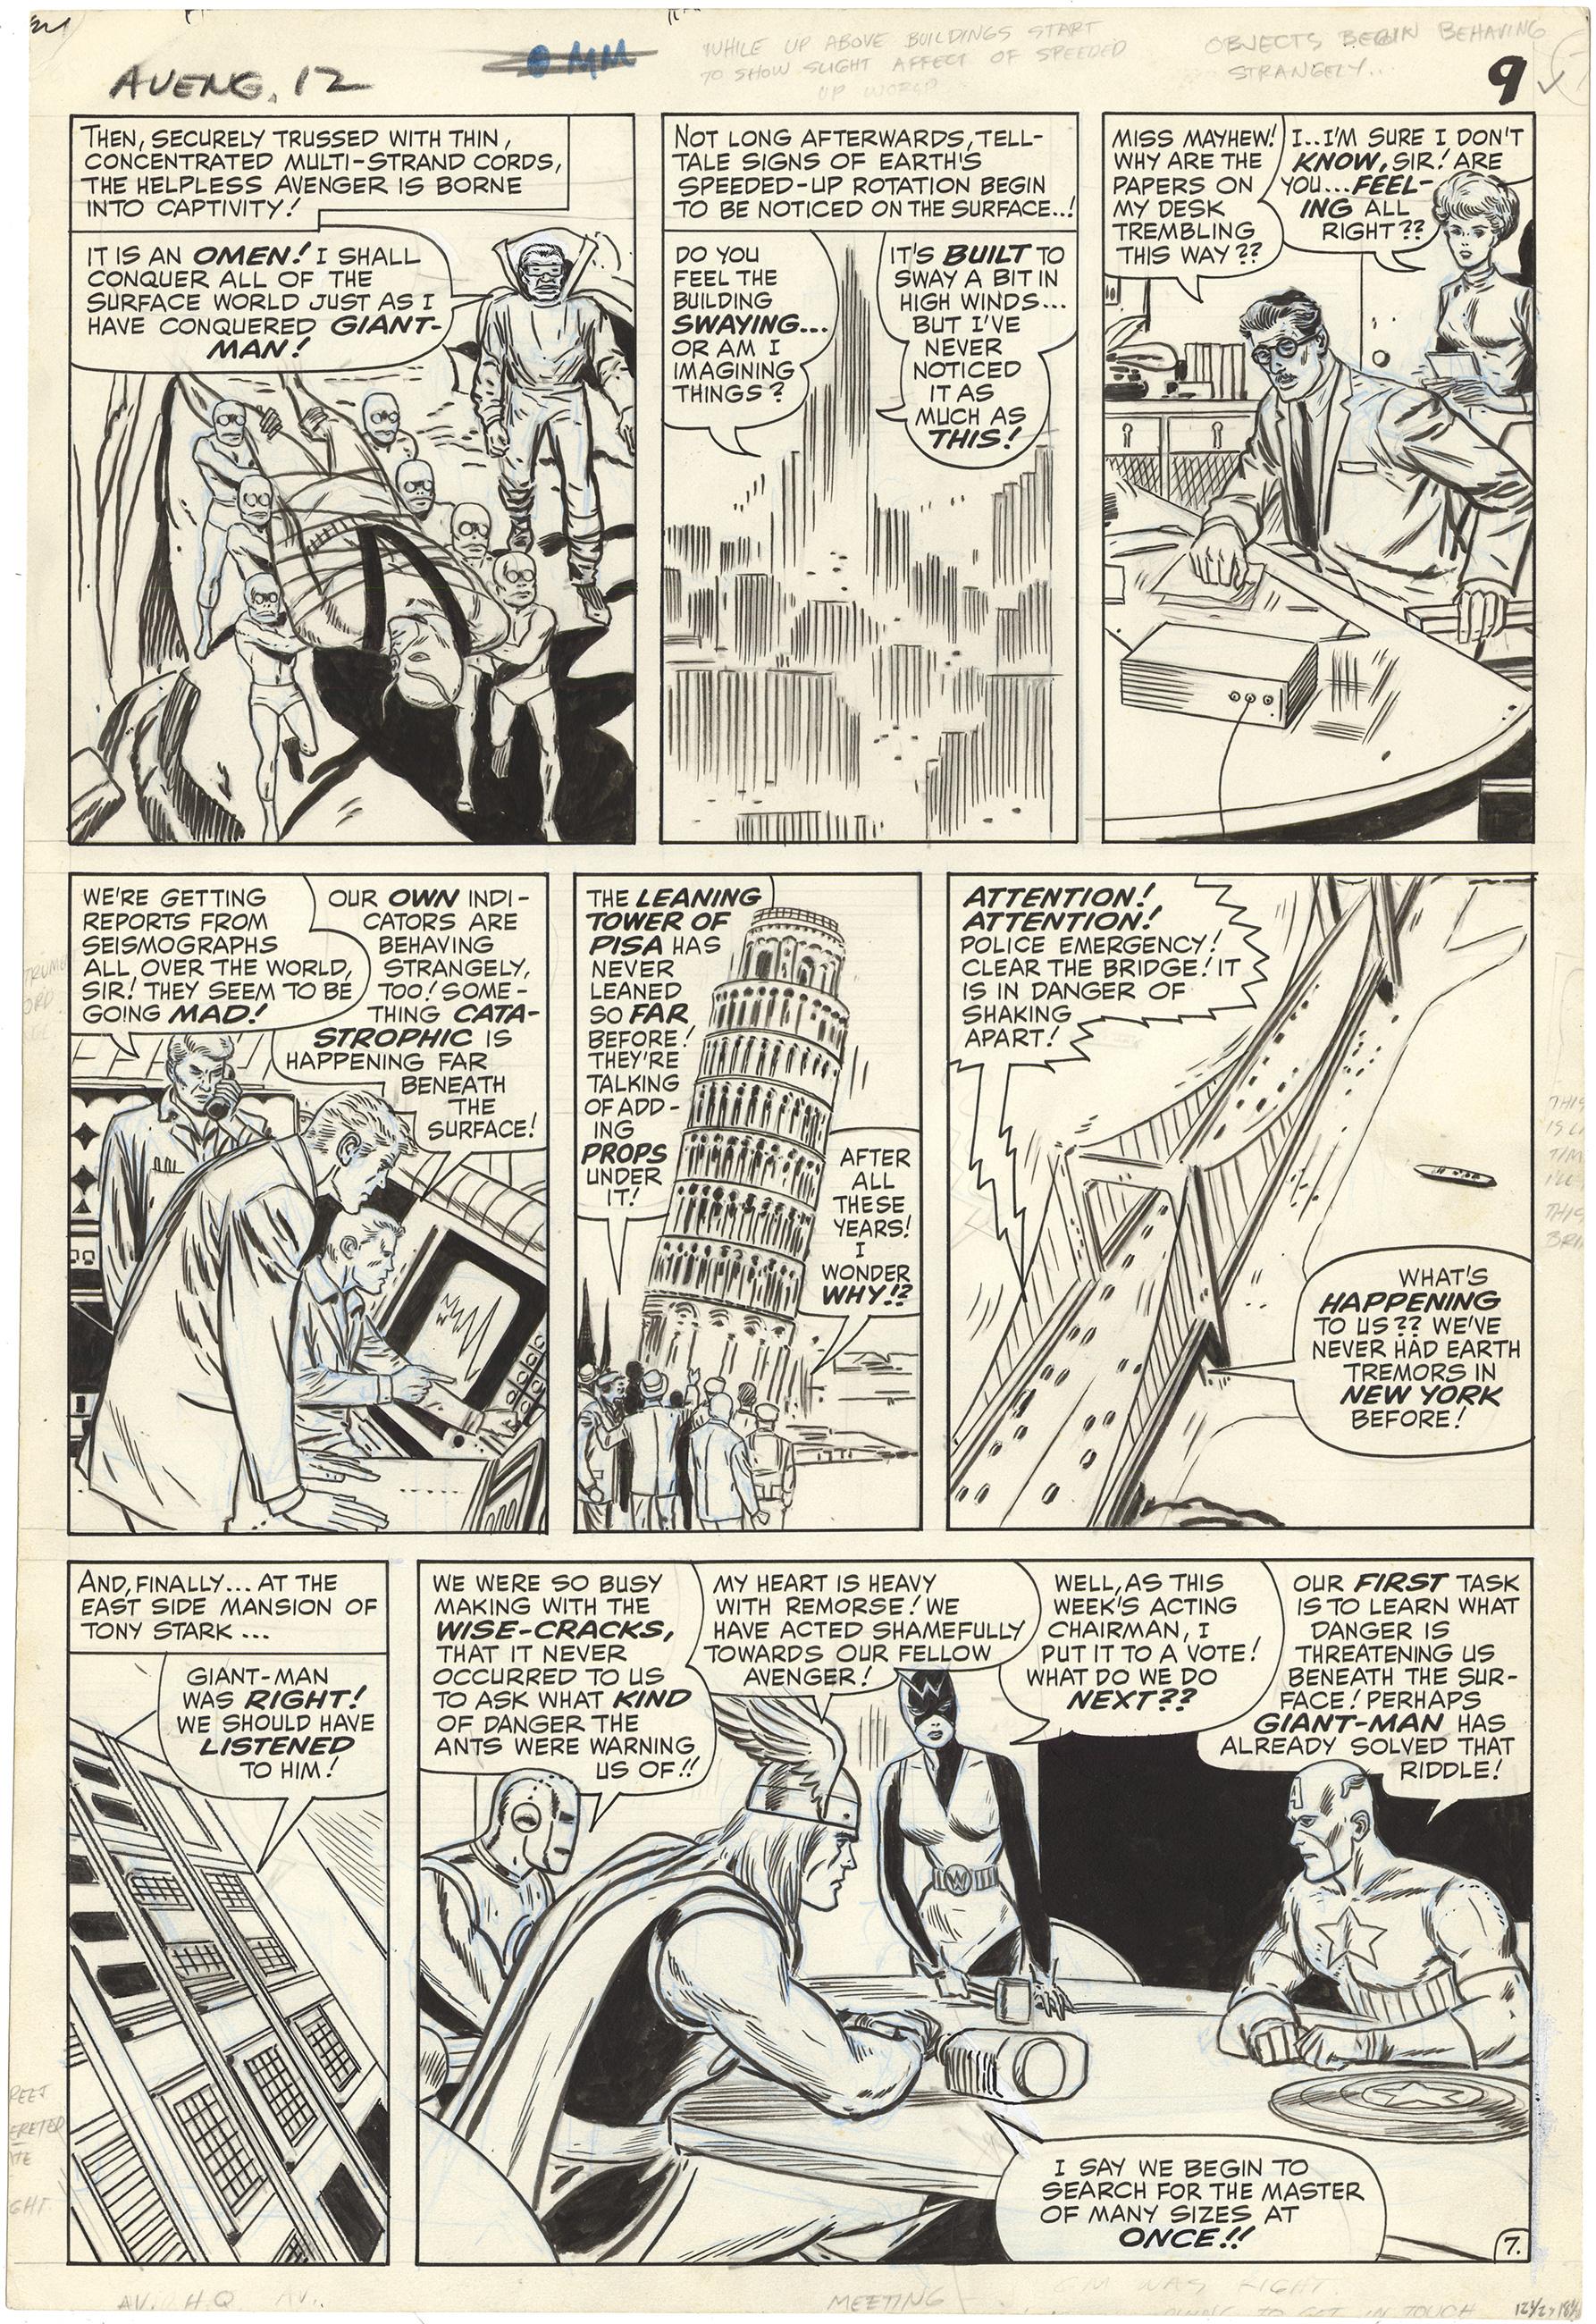 Avengers #12 p7